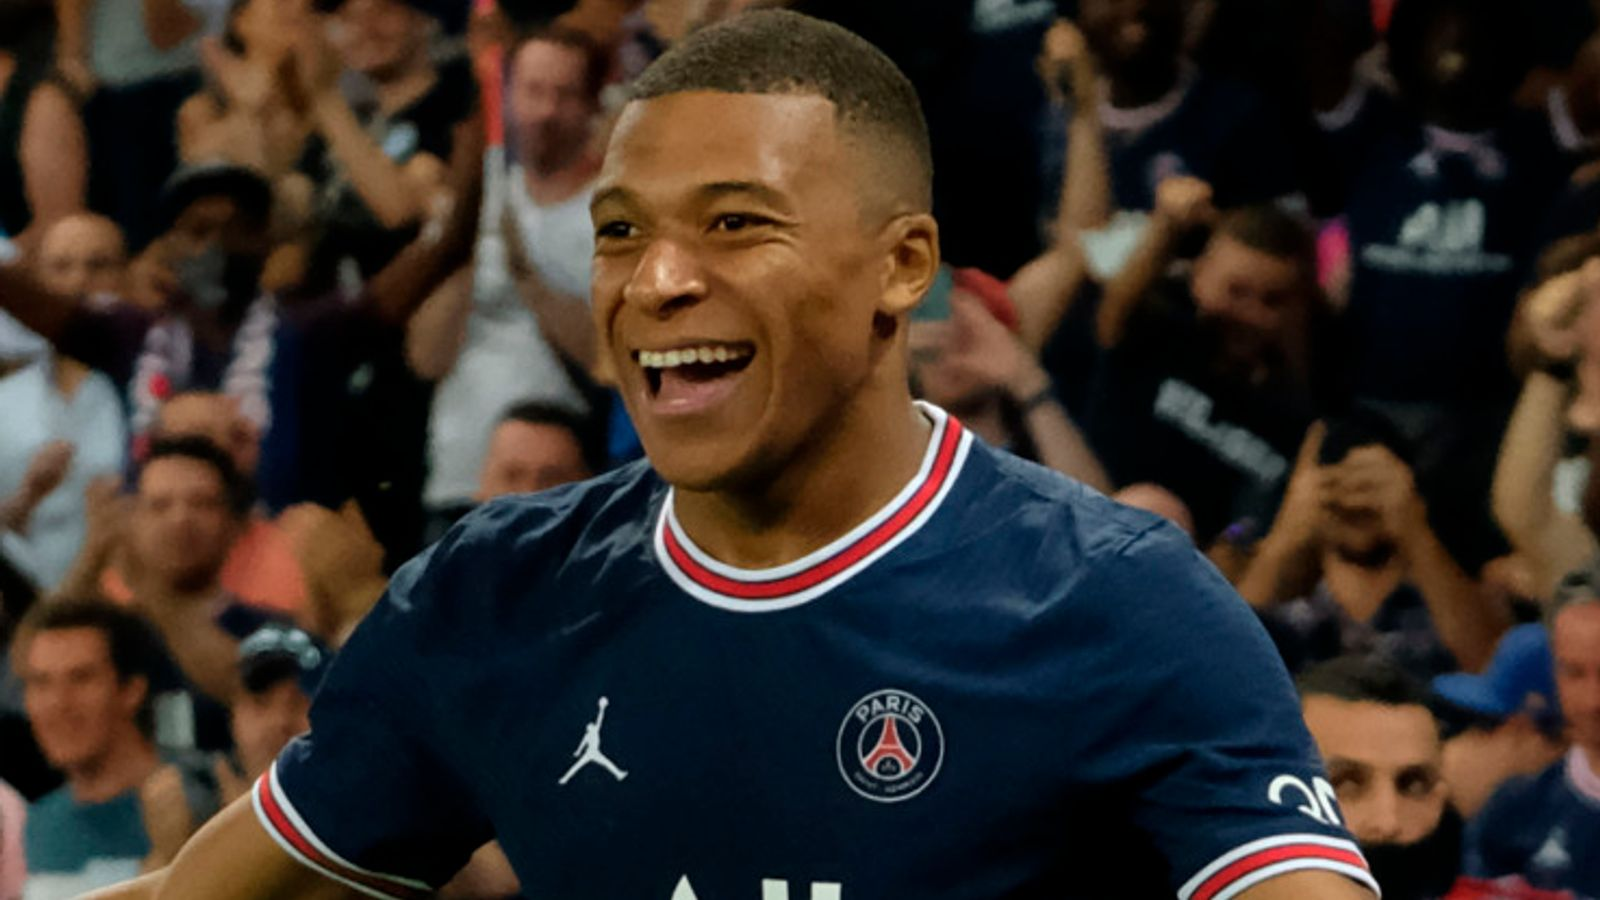 Kylian Mbappe: Real Madrid make £137m transfer bid for Paris Saint-Germain forward